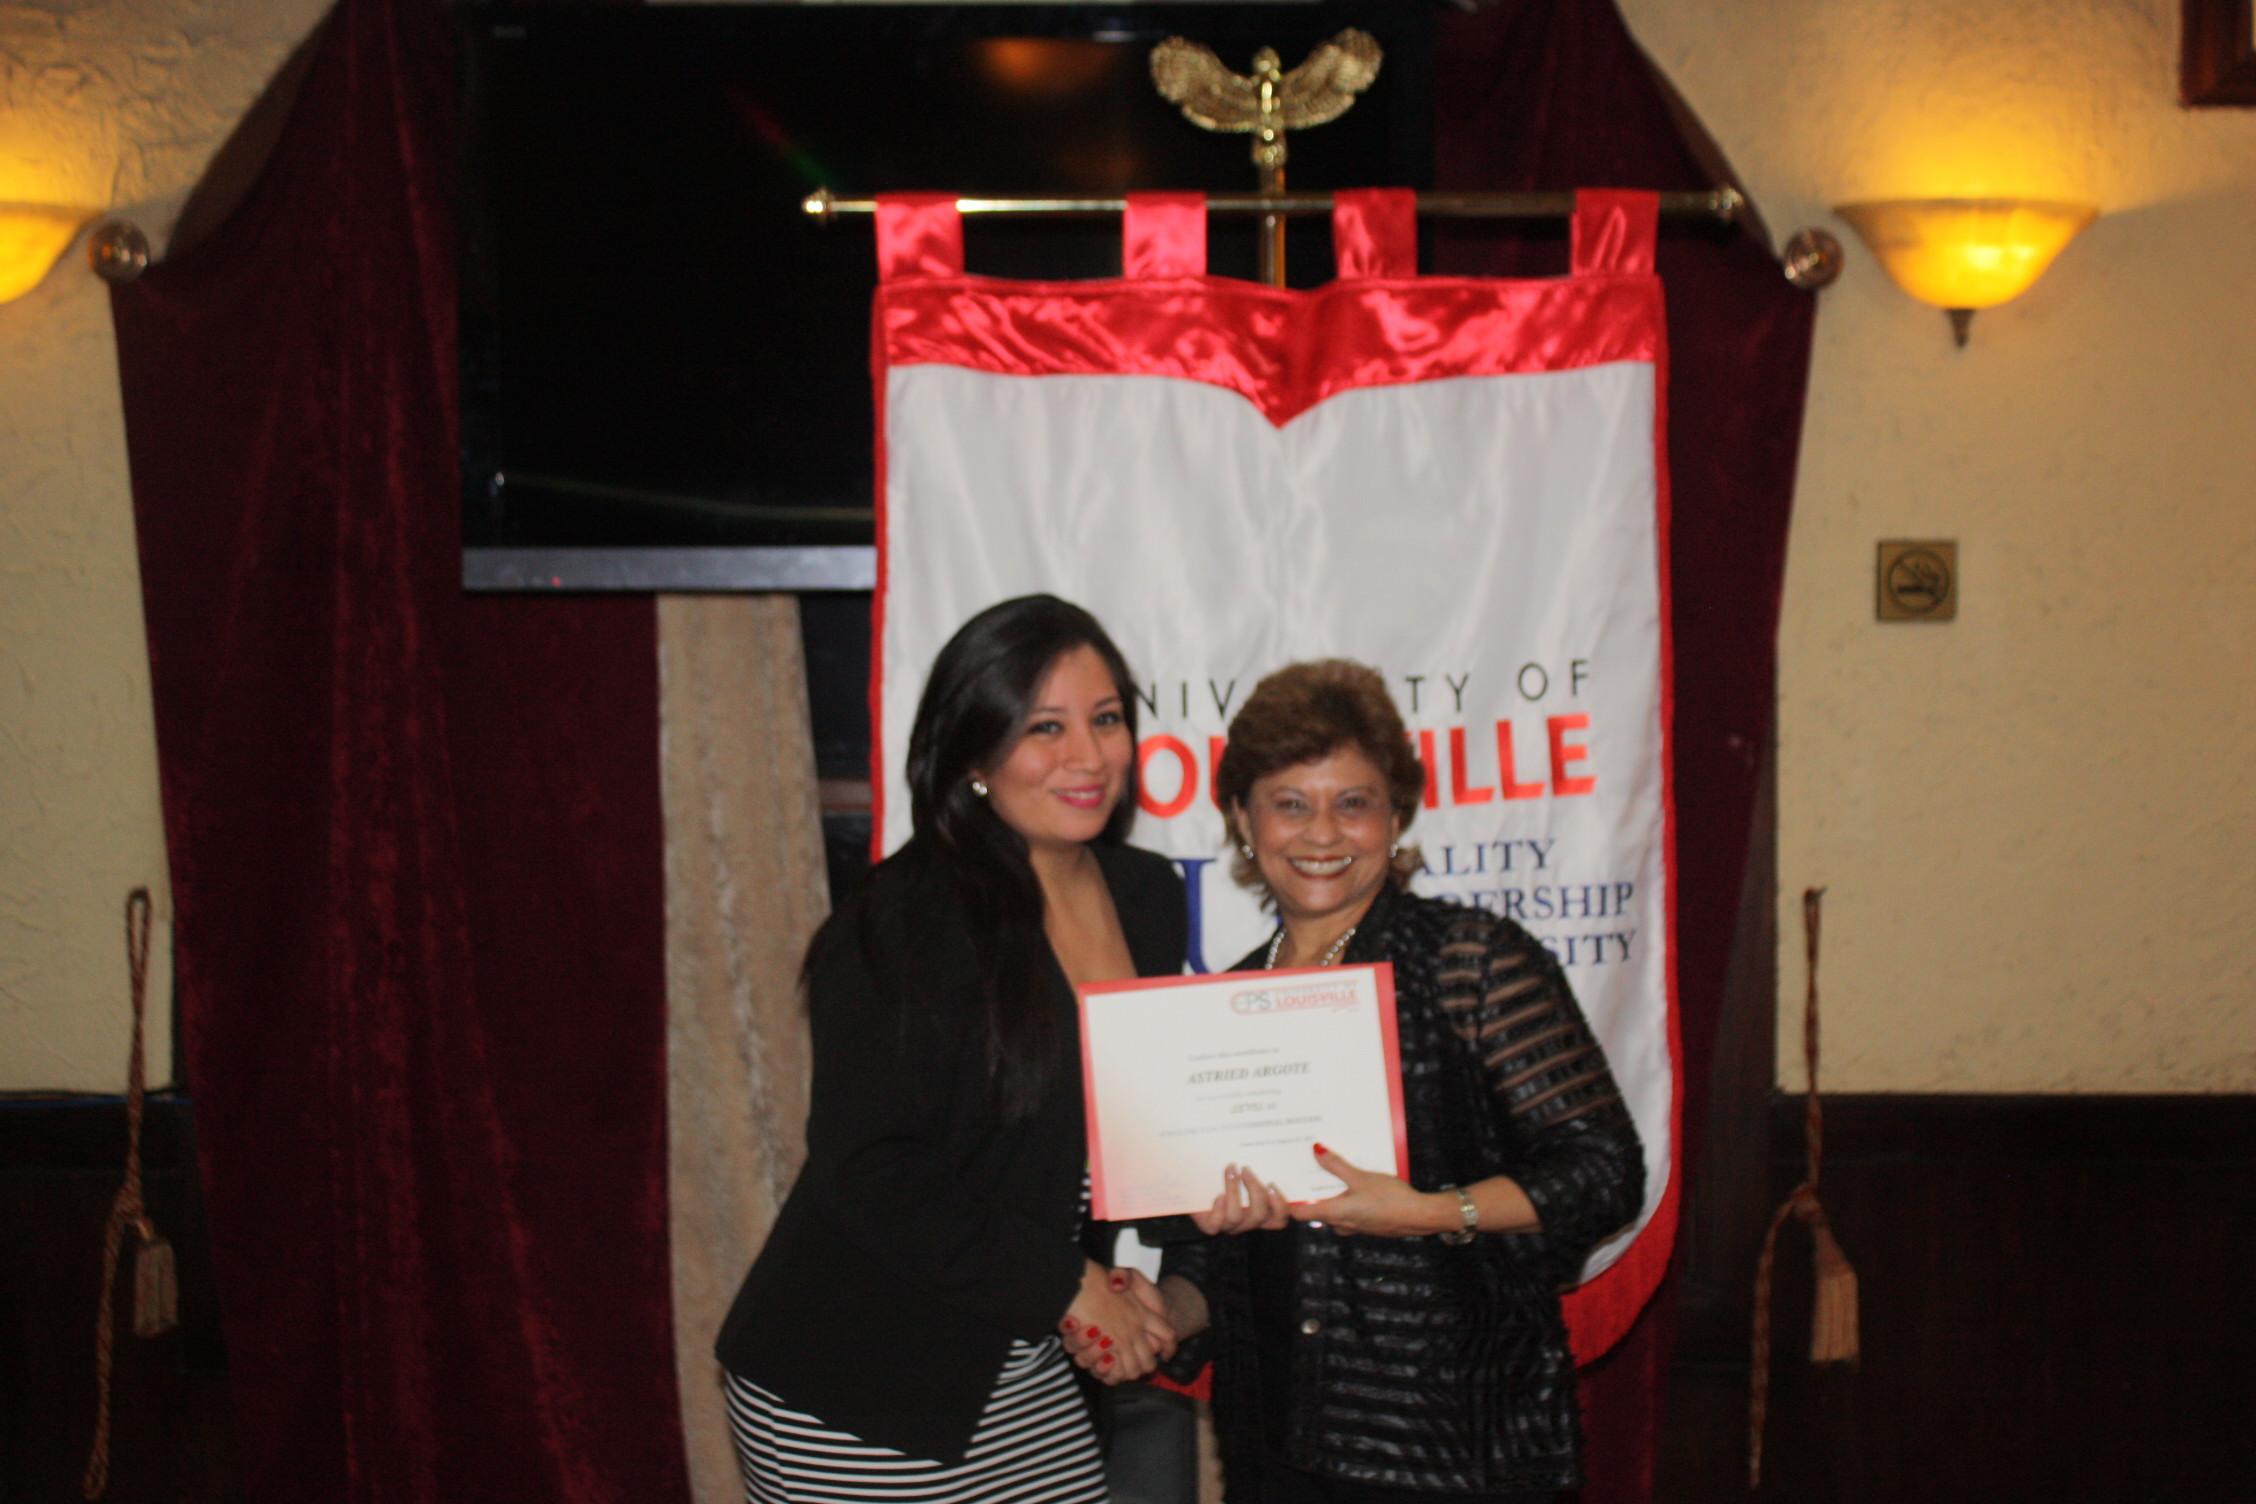 Astried Argote - Cursos de Ingles en Panama University of louisville